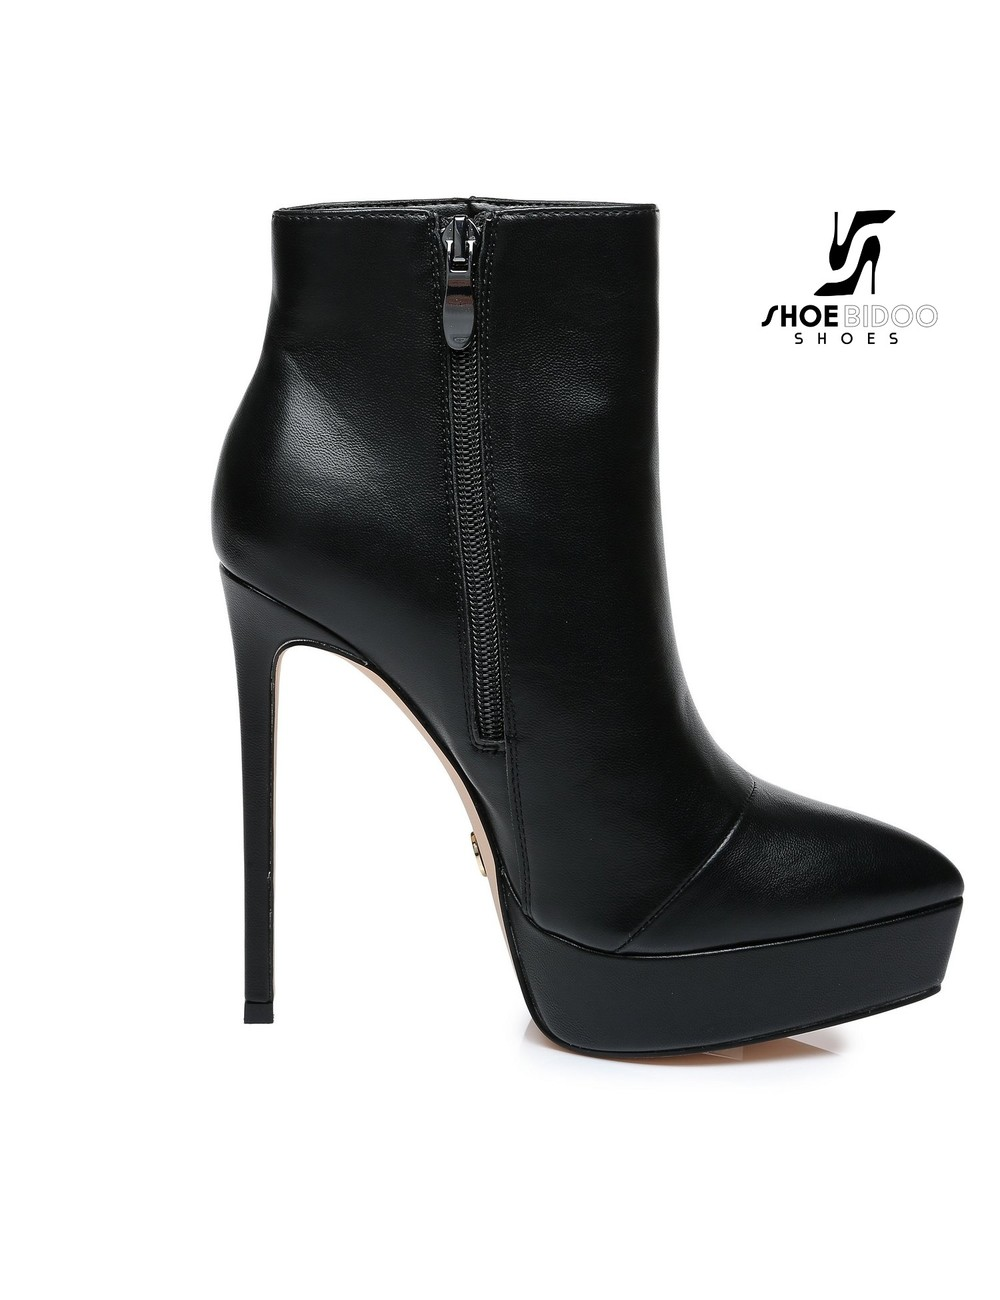 Giaro Giaro Platform Stiefeletten STACK in schwarz